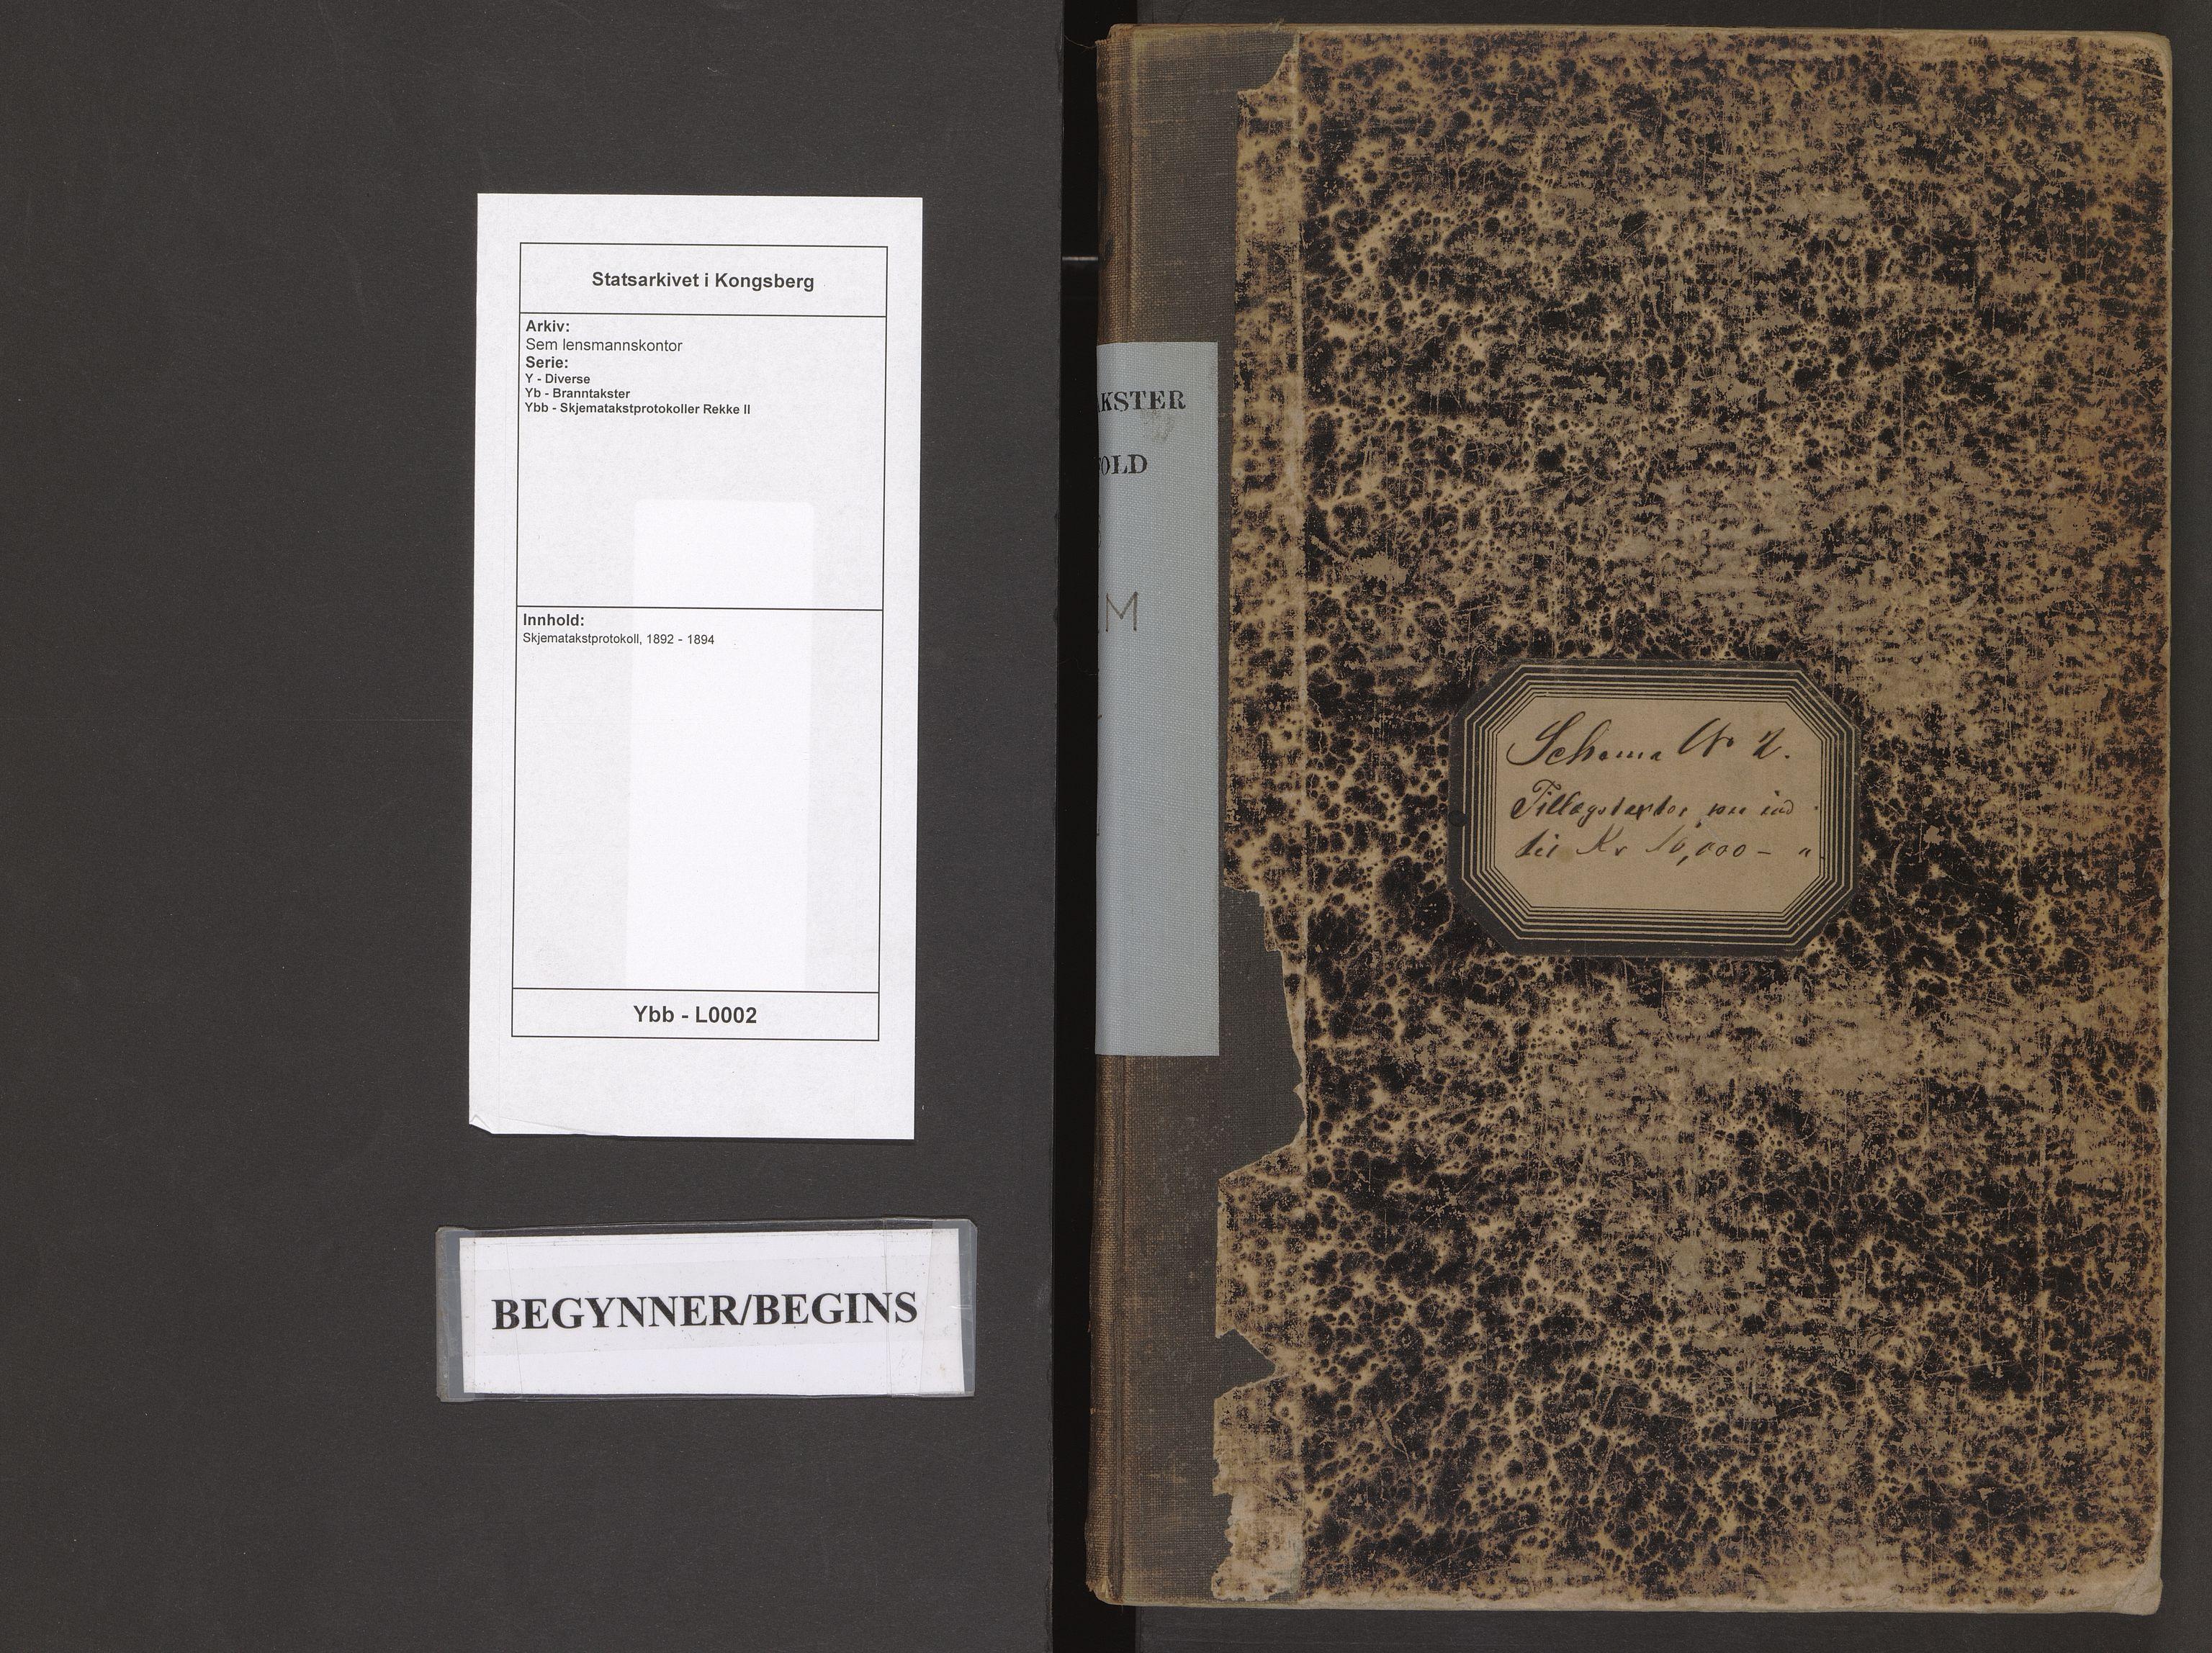 SAKO, Sem lensmannskontor, Y/Yb/Ybb/L0002: Skjematakstprotokoll, 1892-1894